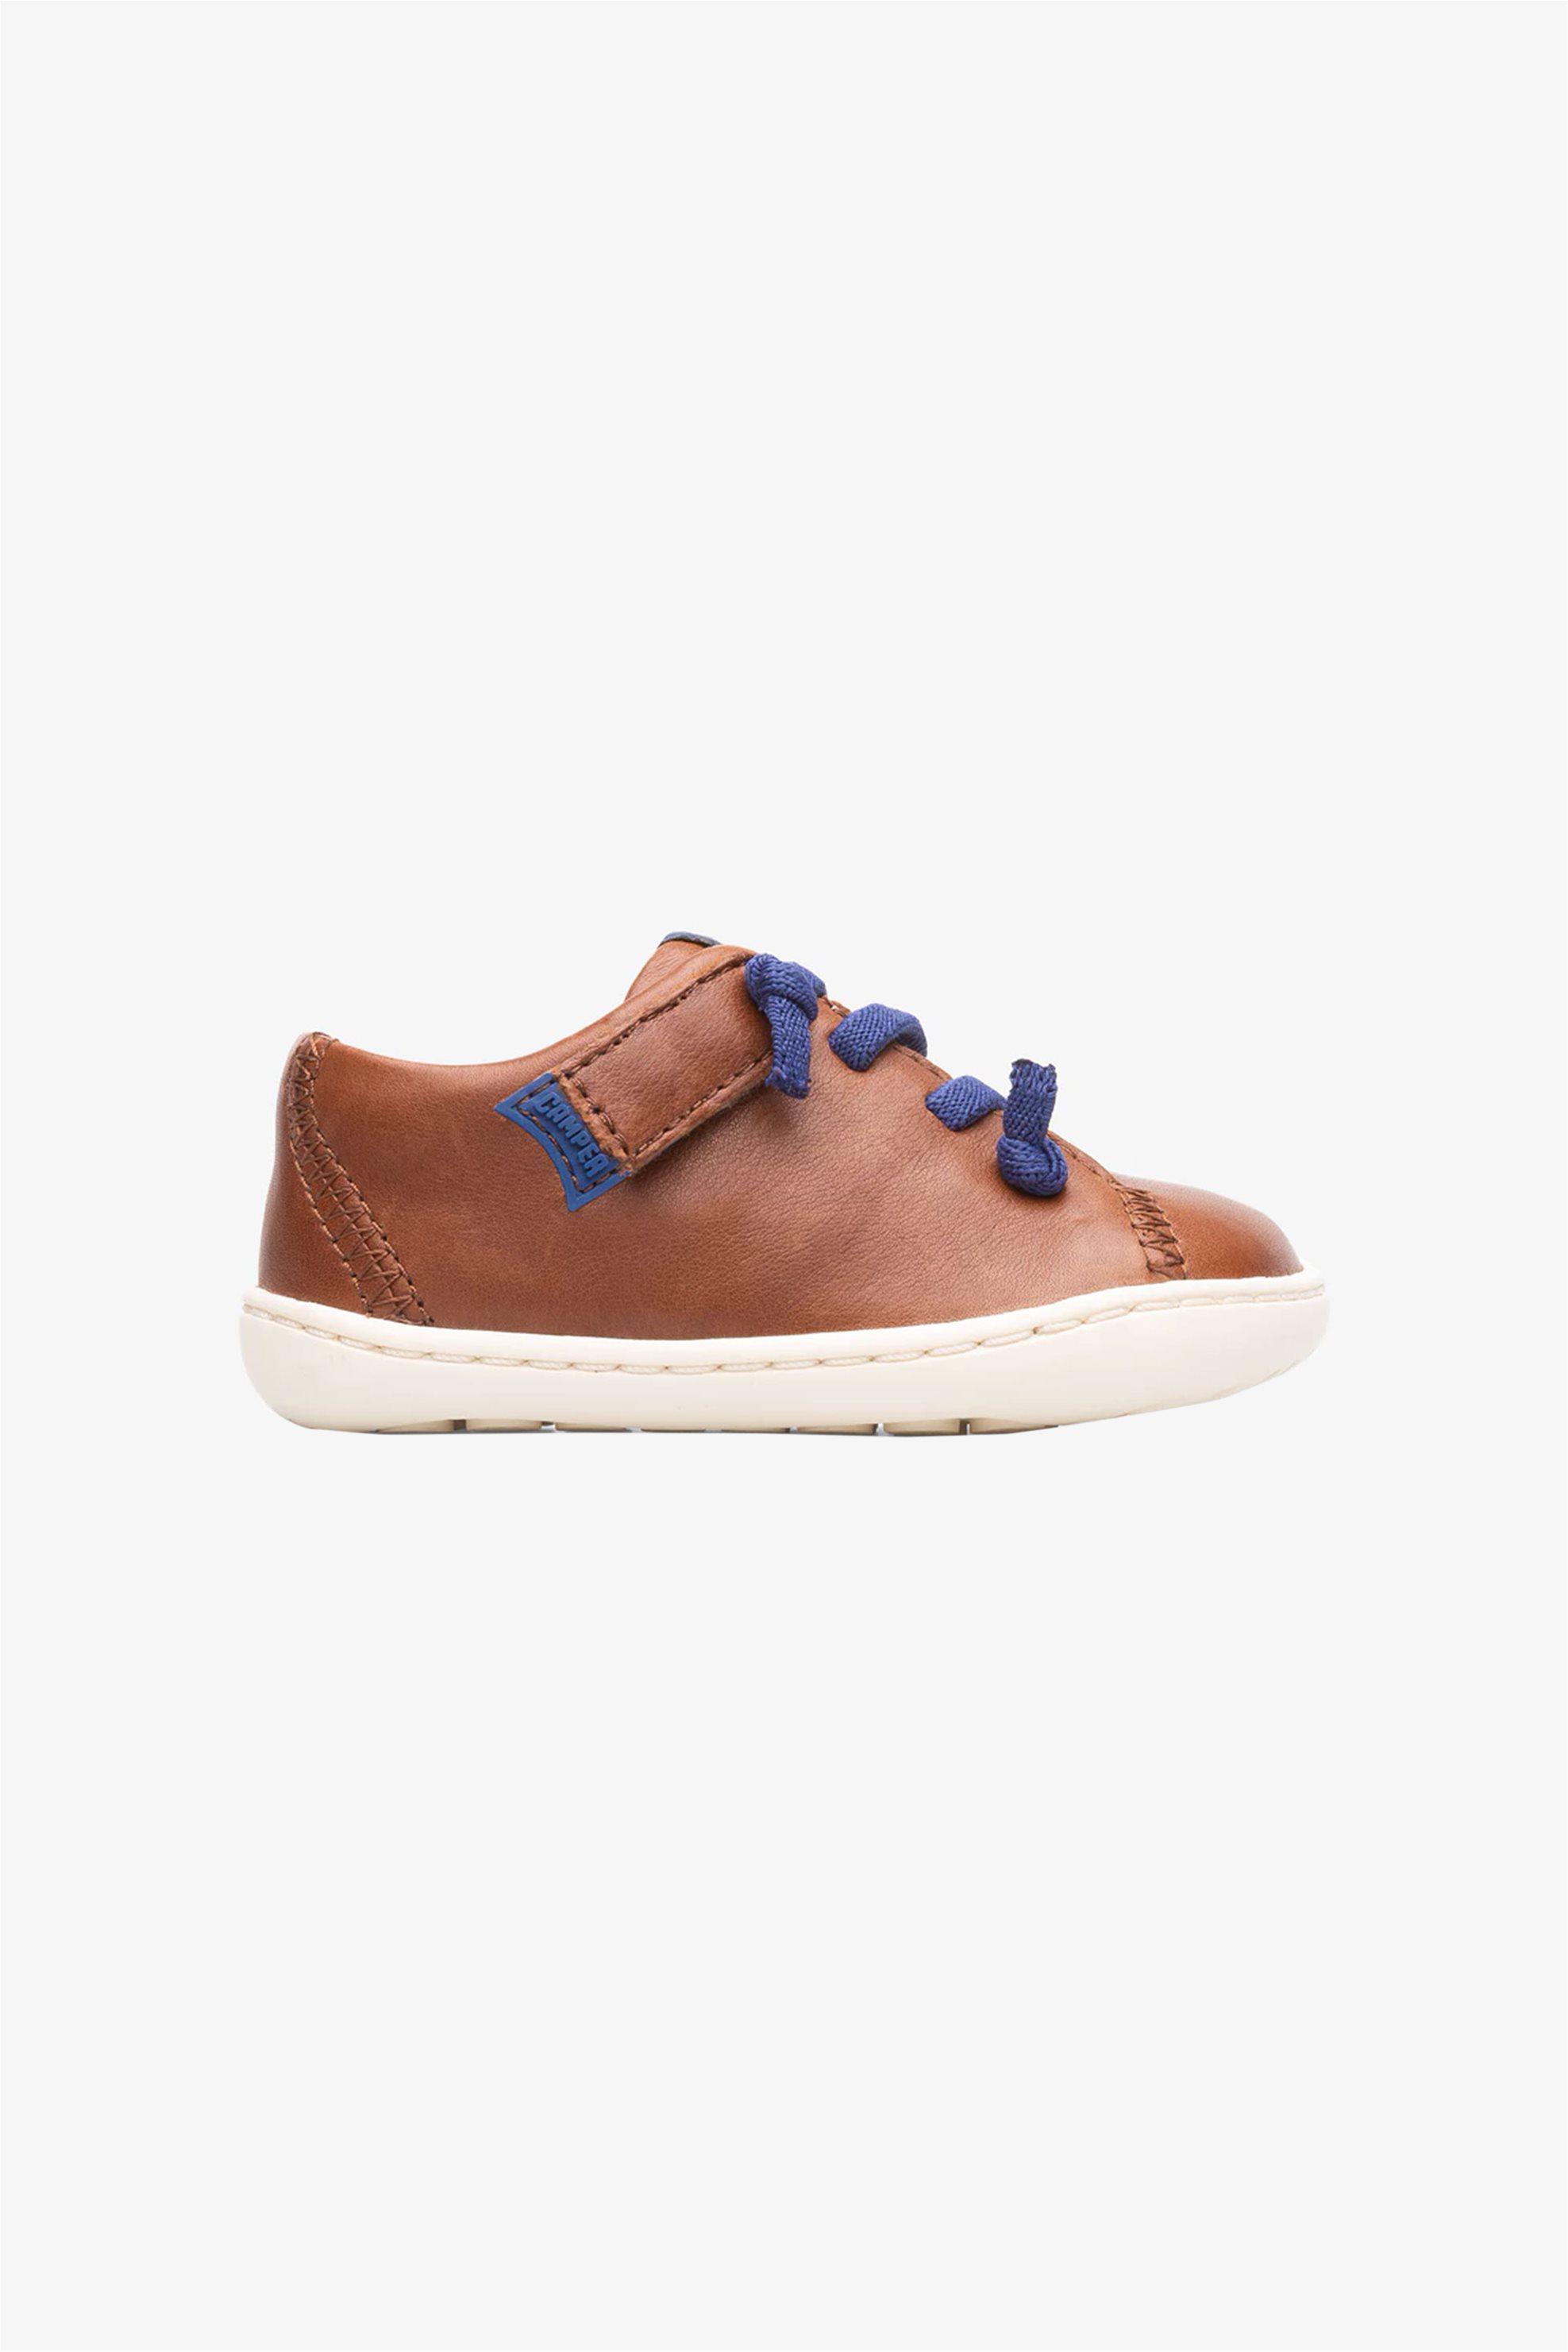 "Camper βρεφικά δερμάτινα sneakers με κορδόνια ζιγκ ζαγκ ""Peu..."